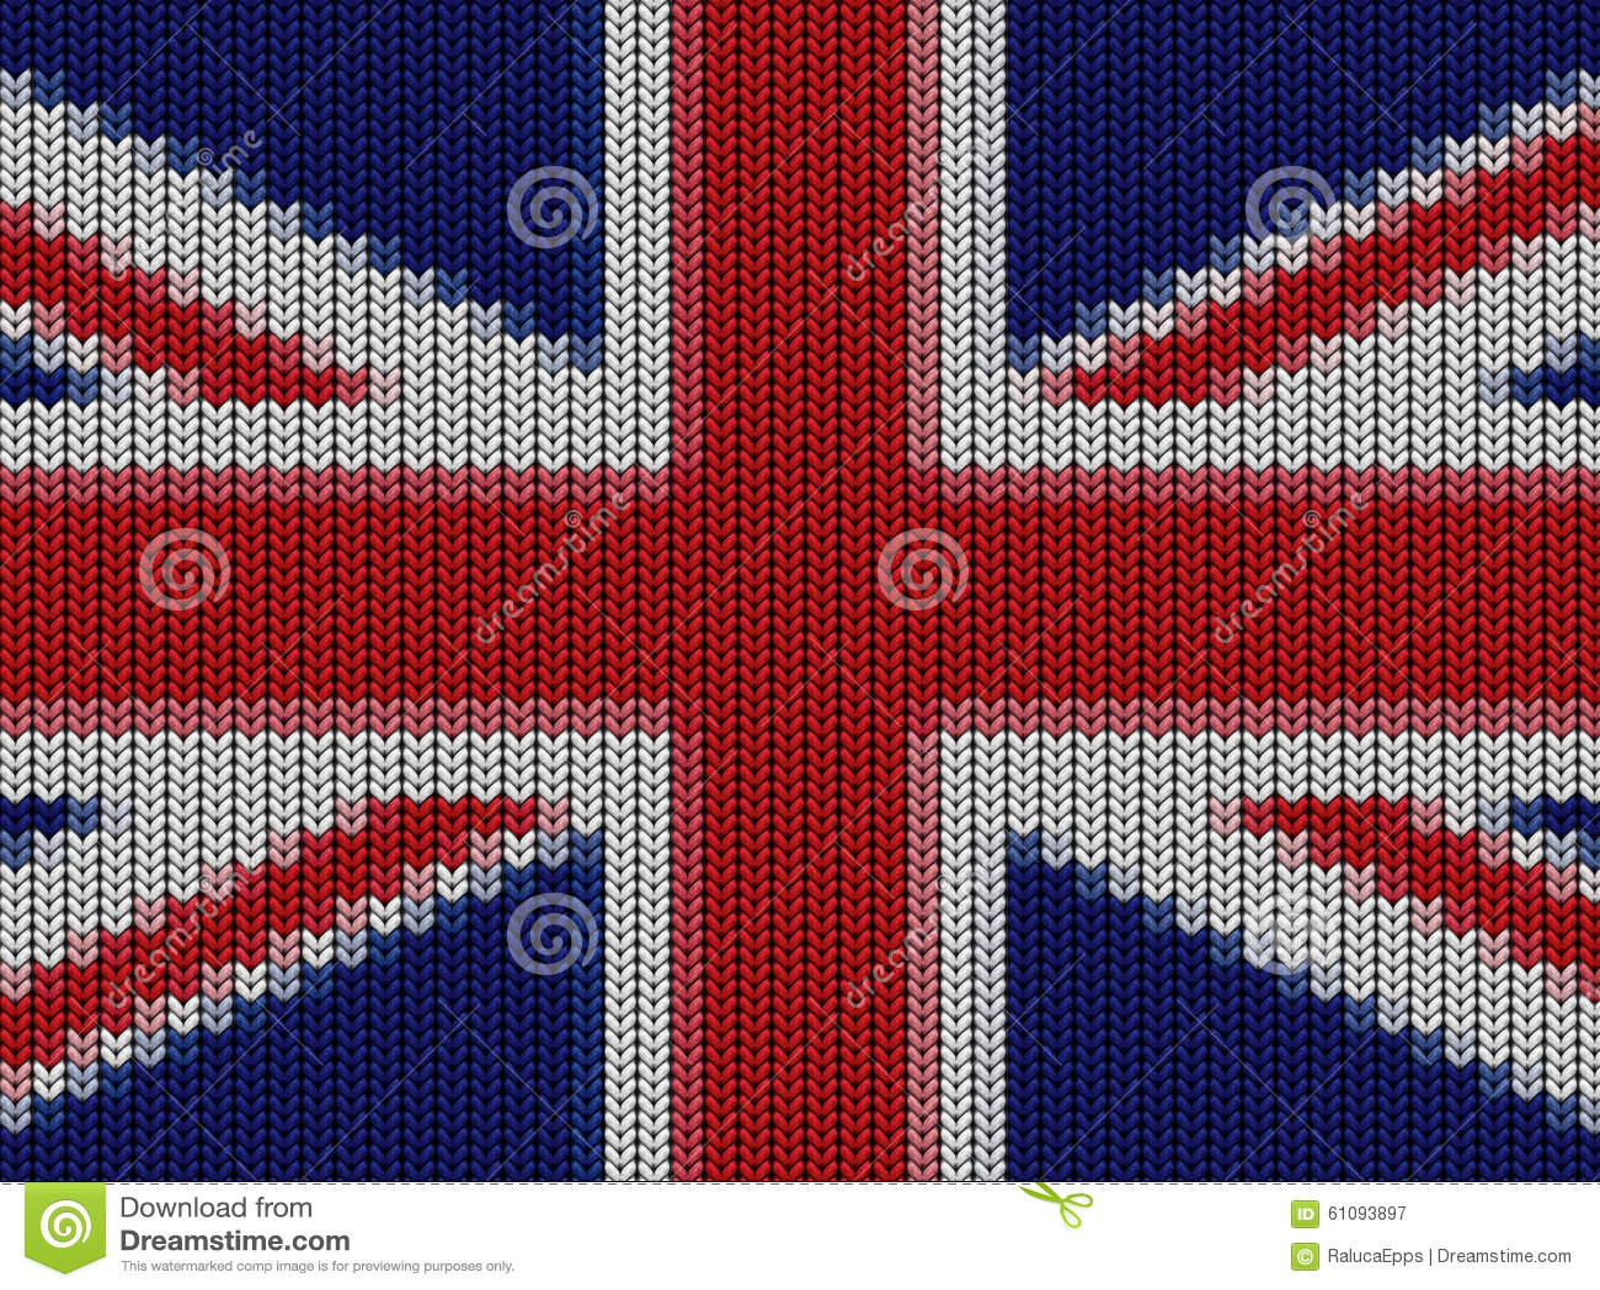 British Knitting Patterns : UK English Flag In Knitting Pattern Stock Illustration - Image: 61093897